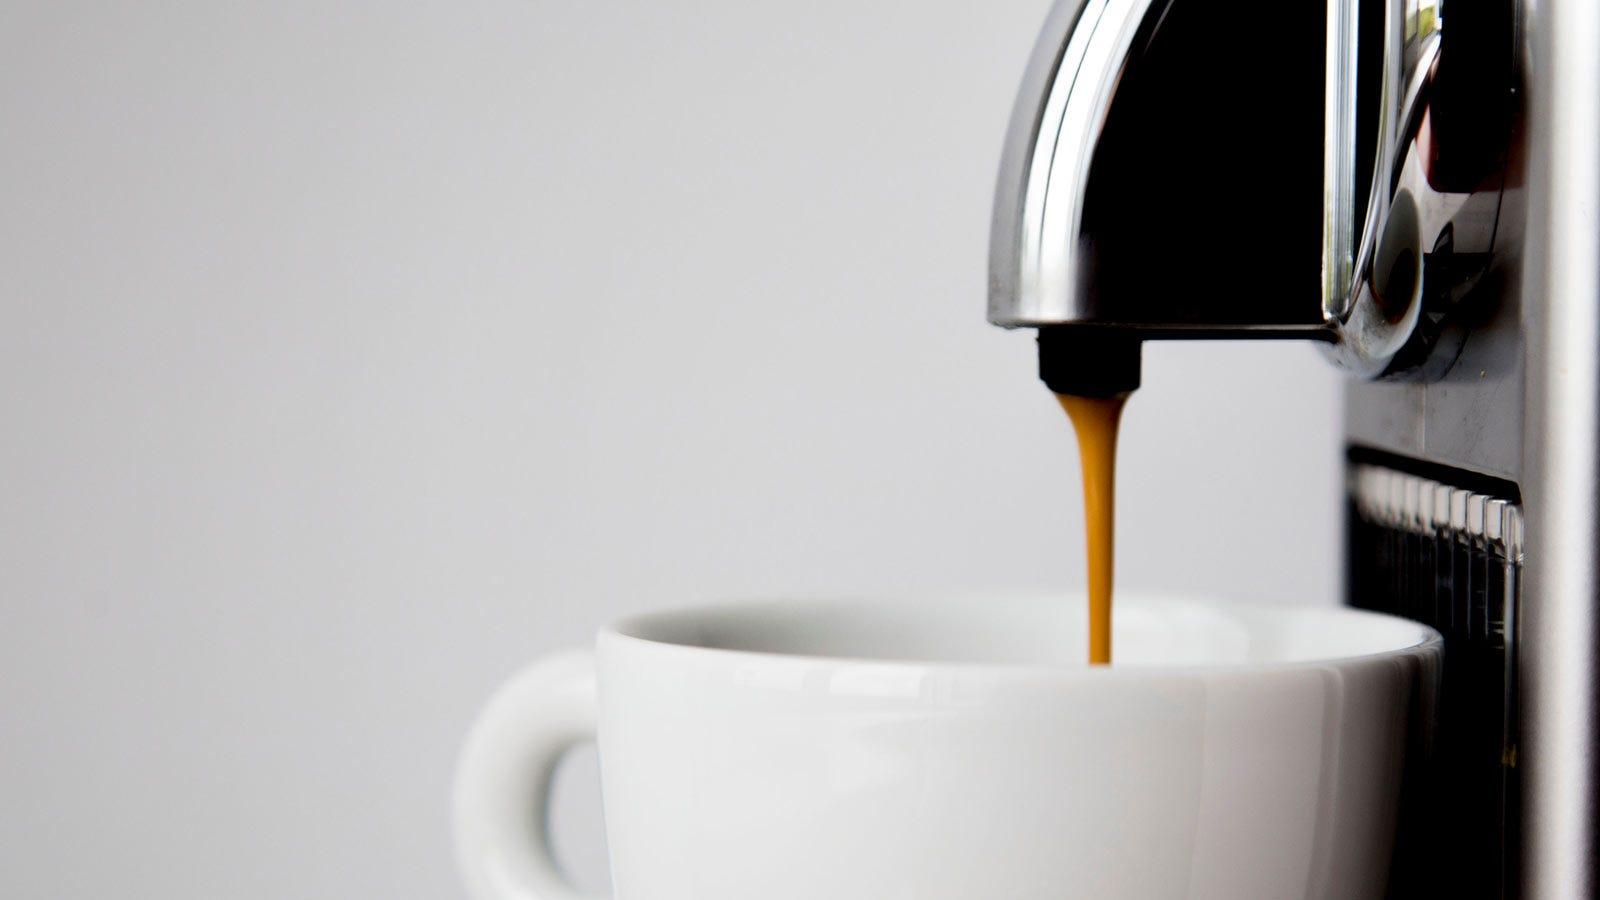 A capsule coffee machine dispensing coffee into a mug.